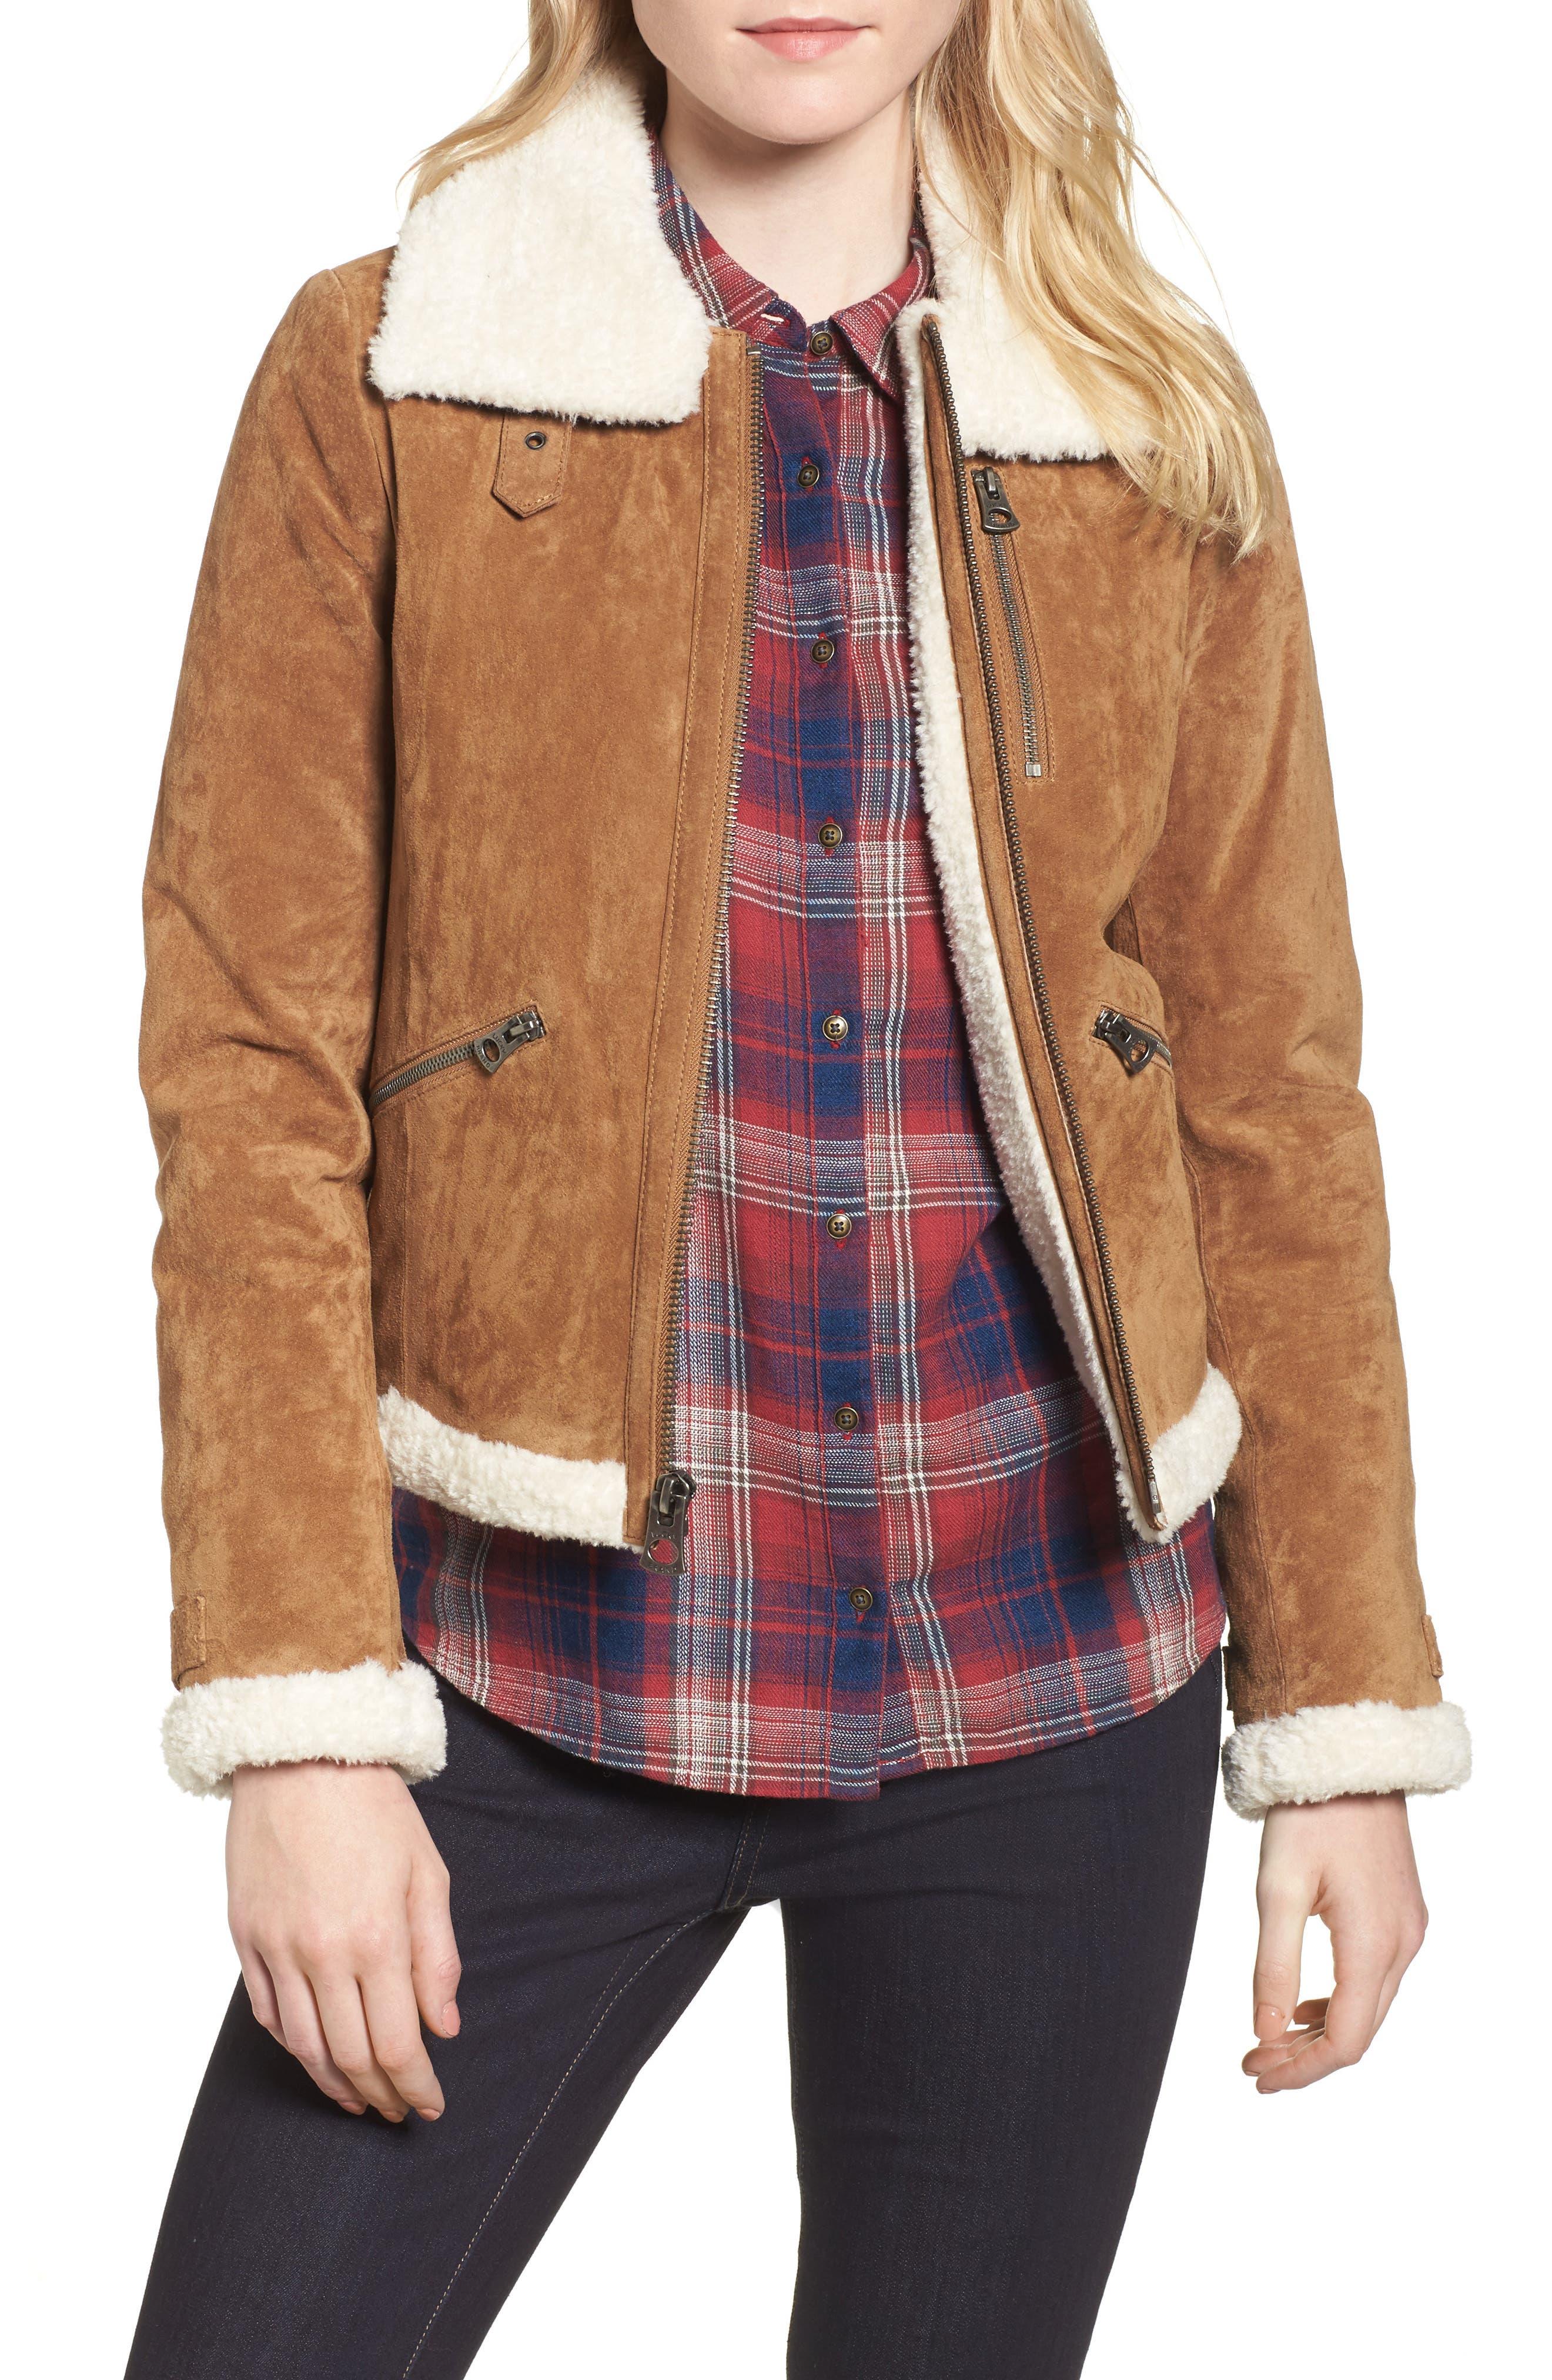 Leather Jacket with Faux Fur Trim,                             Main thumbnail 1, color,                             235